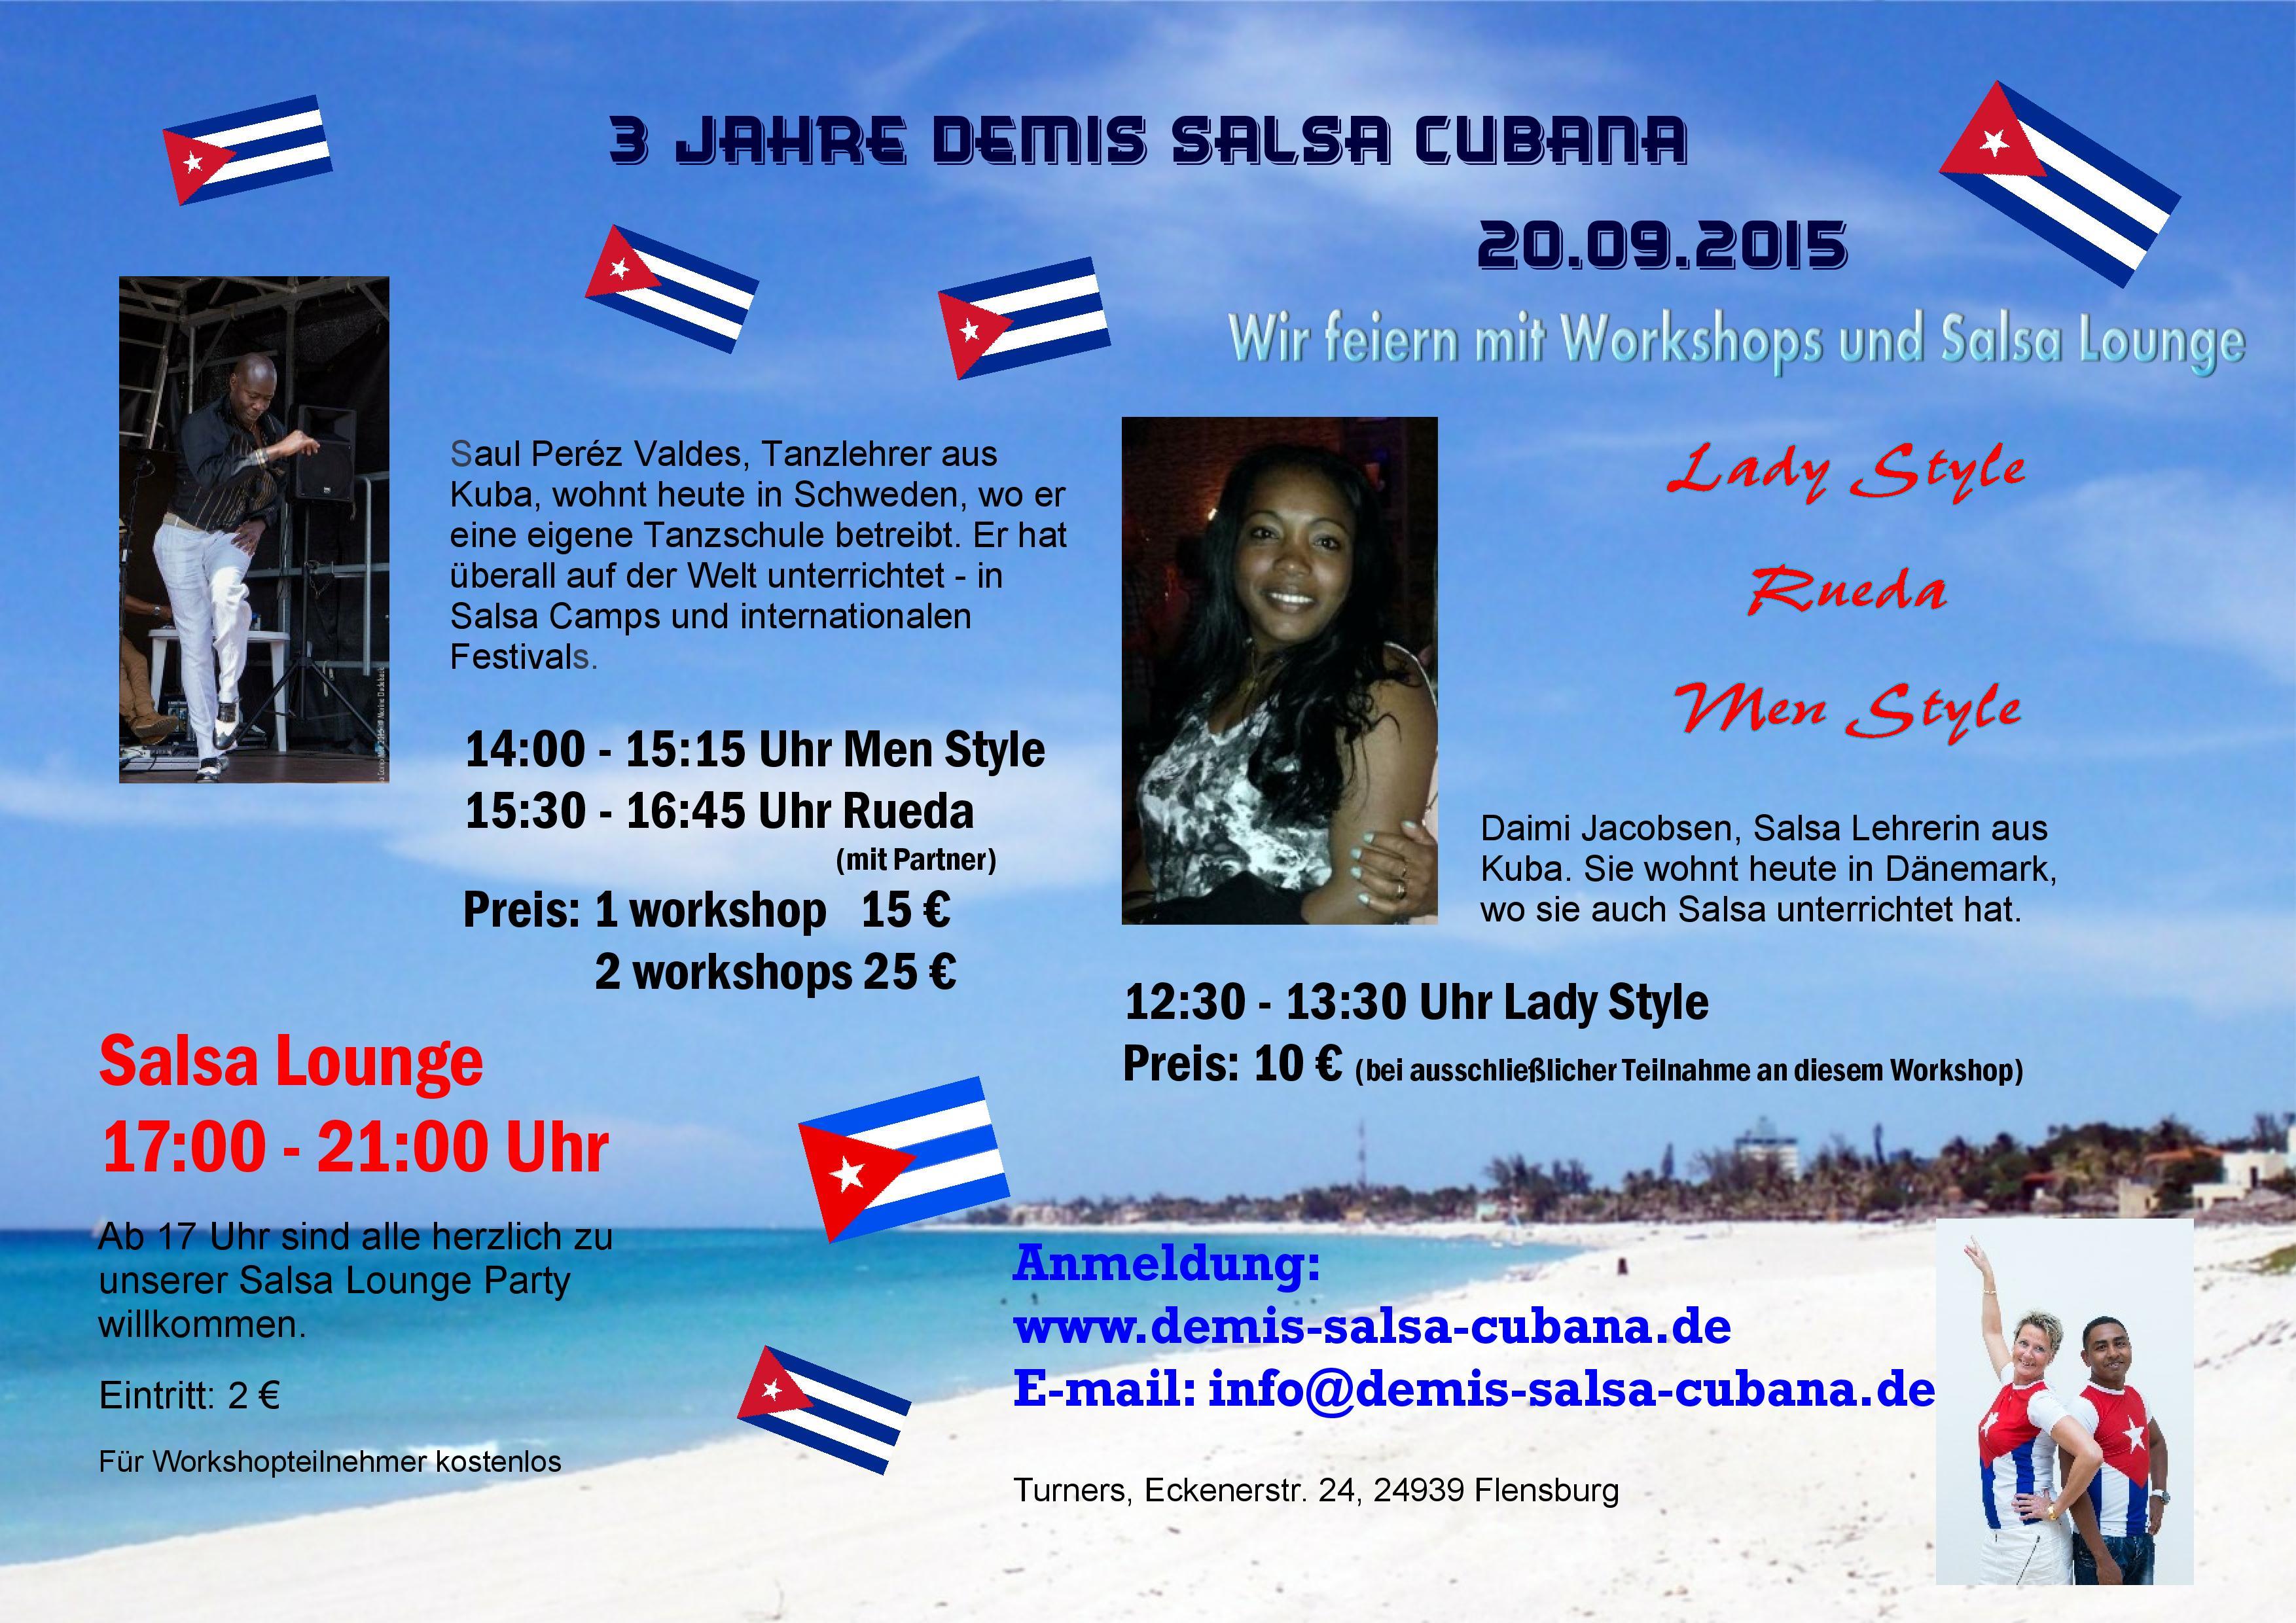 Salsa Workshop - 3 Jahre Demis Salsa Cubana in Flensburg